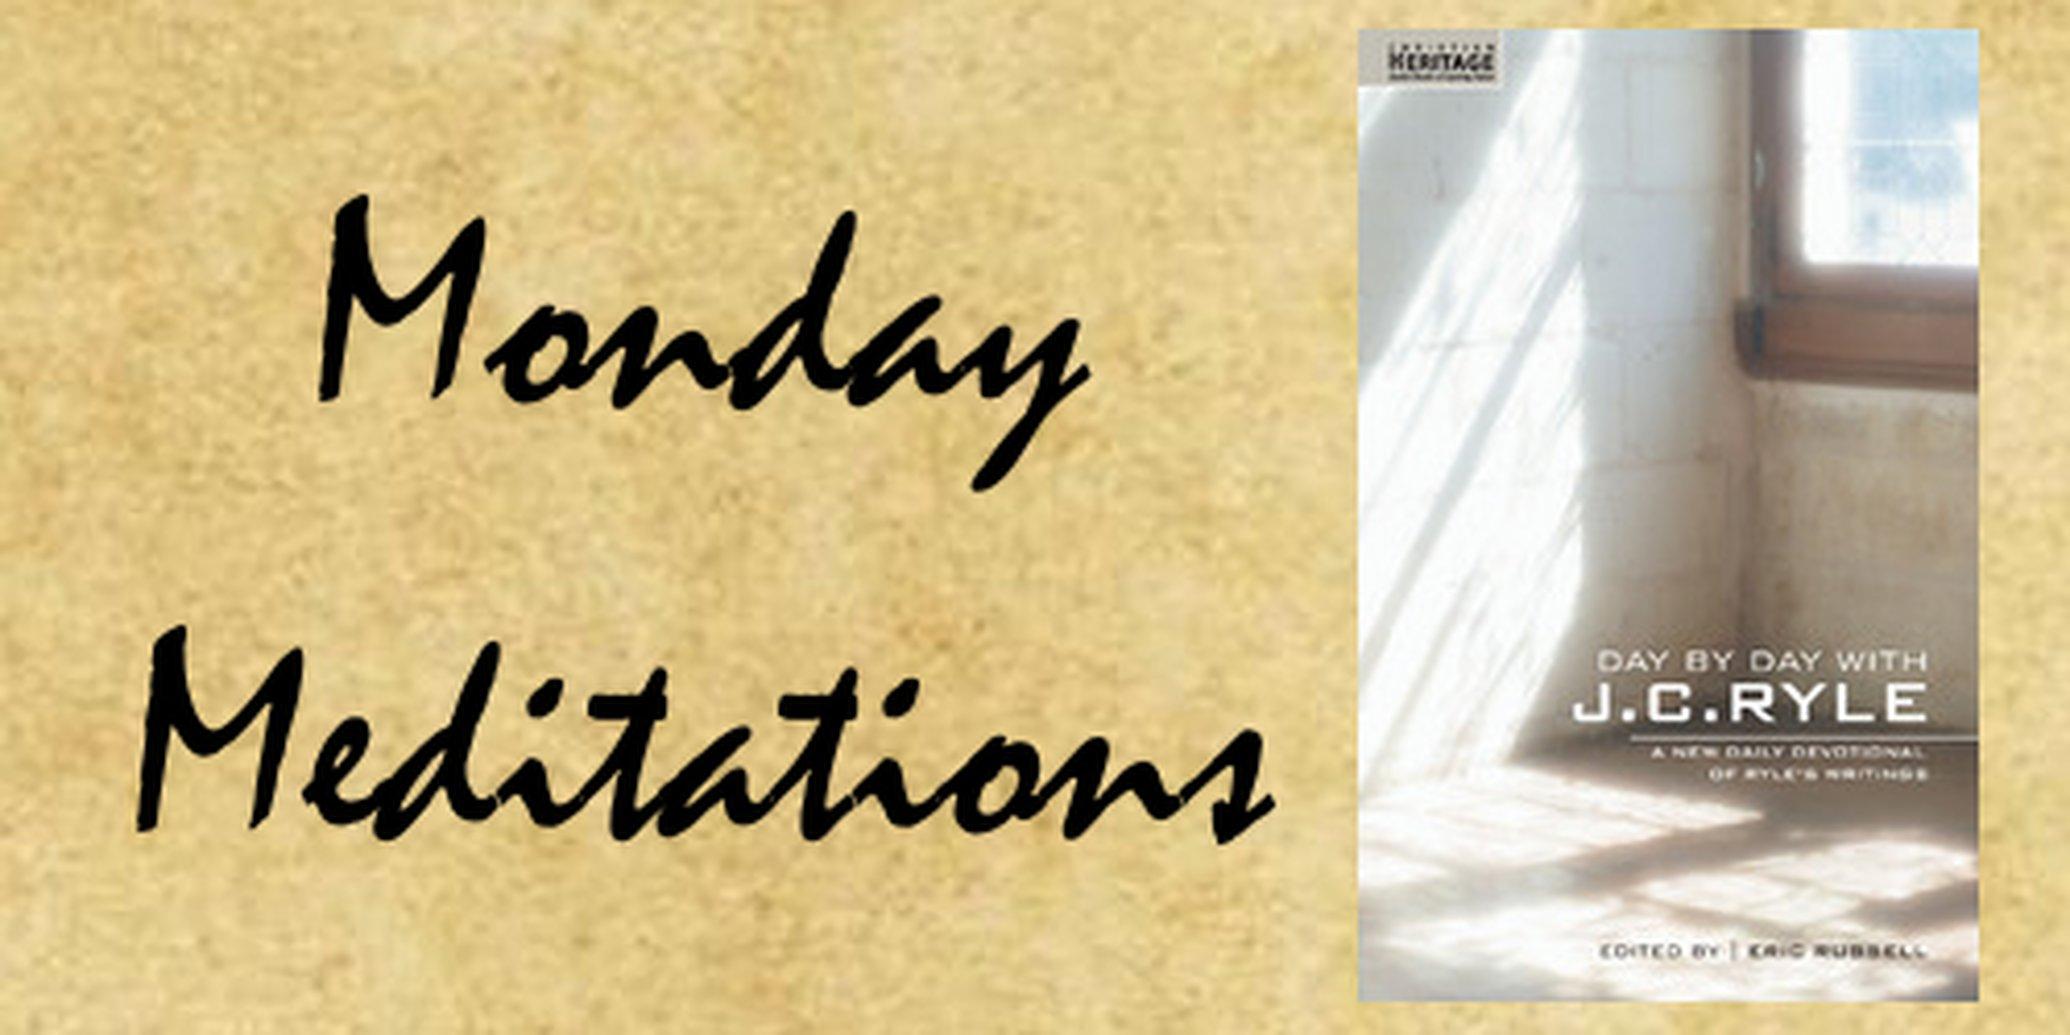 Monday Meditations: Unity